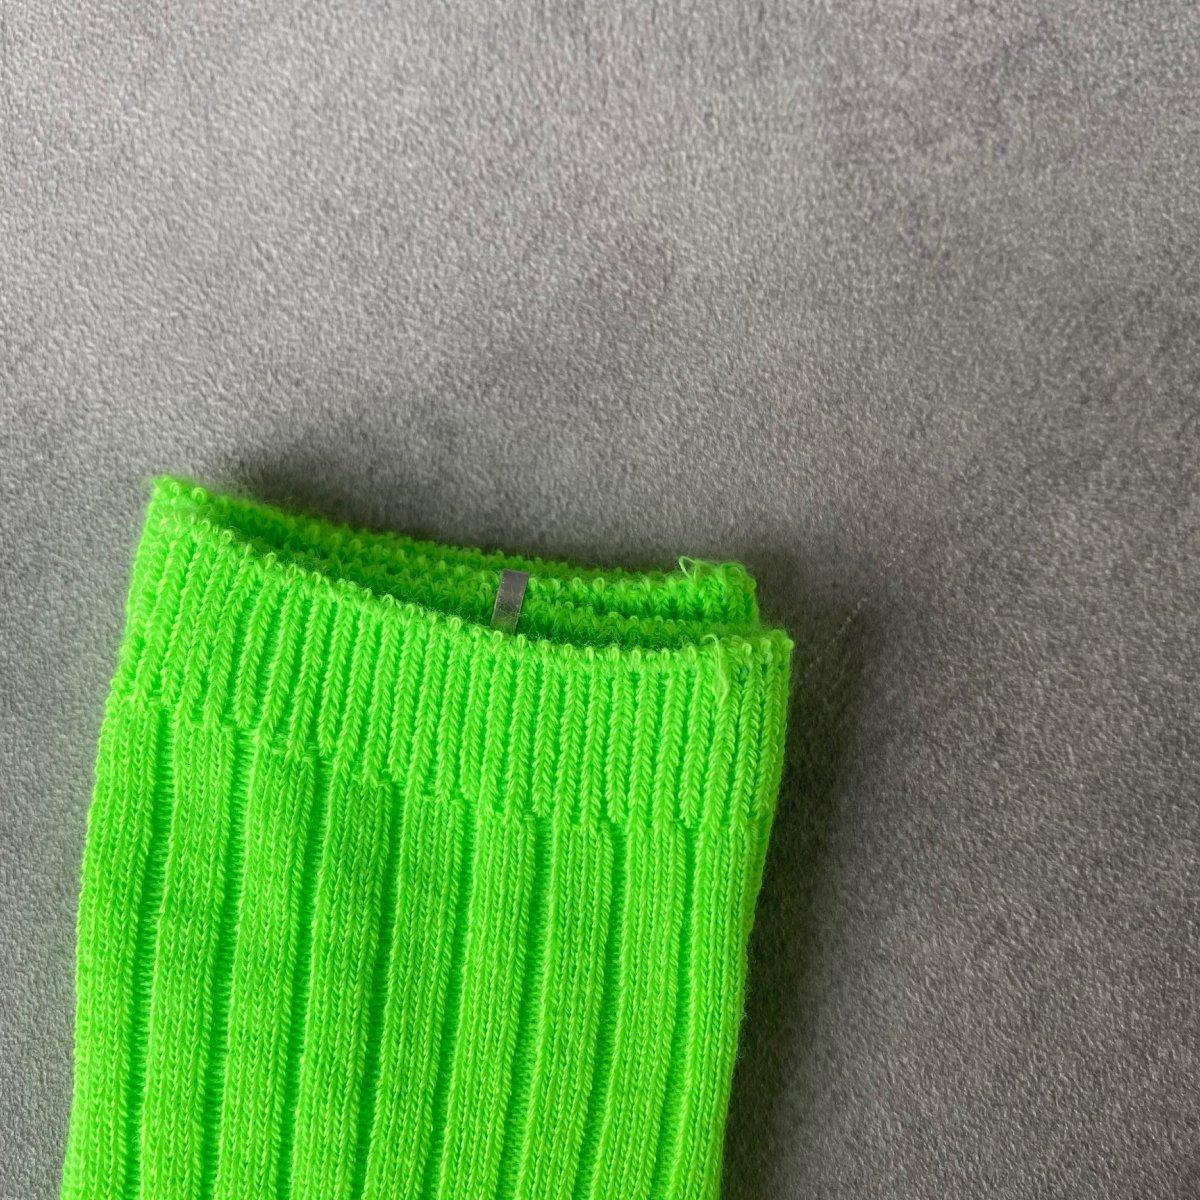 【BABY】Neon Socks 詳細画像6